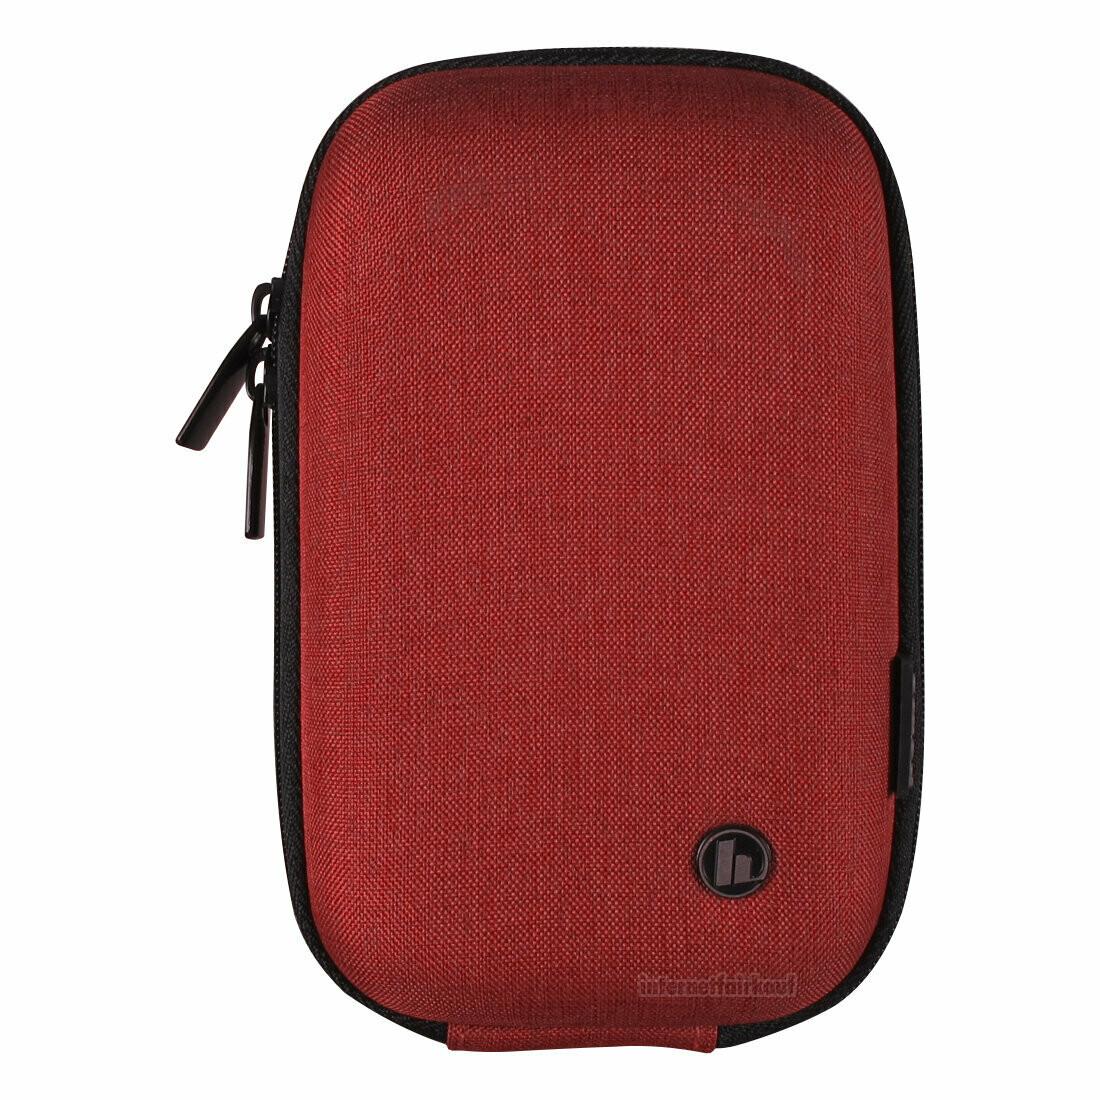 Hardcase Kameratasche rot passend für Olympus Tough TG-3 TG-4 TG-5 TG-6